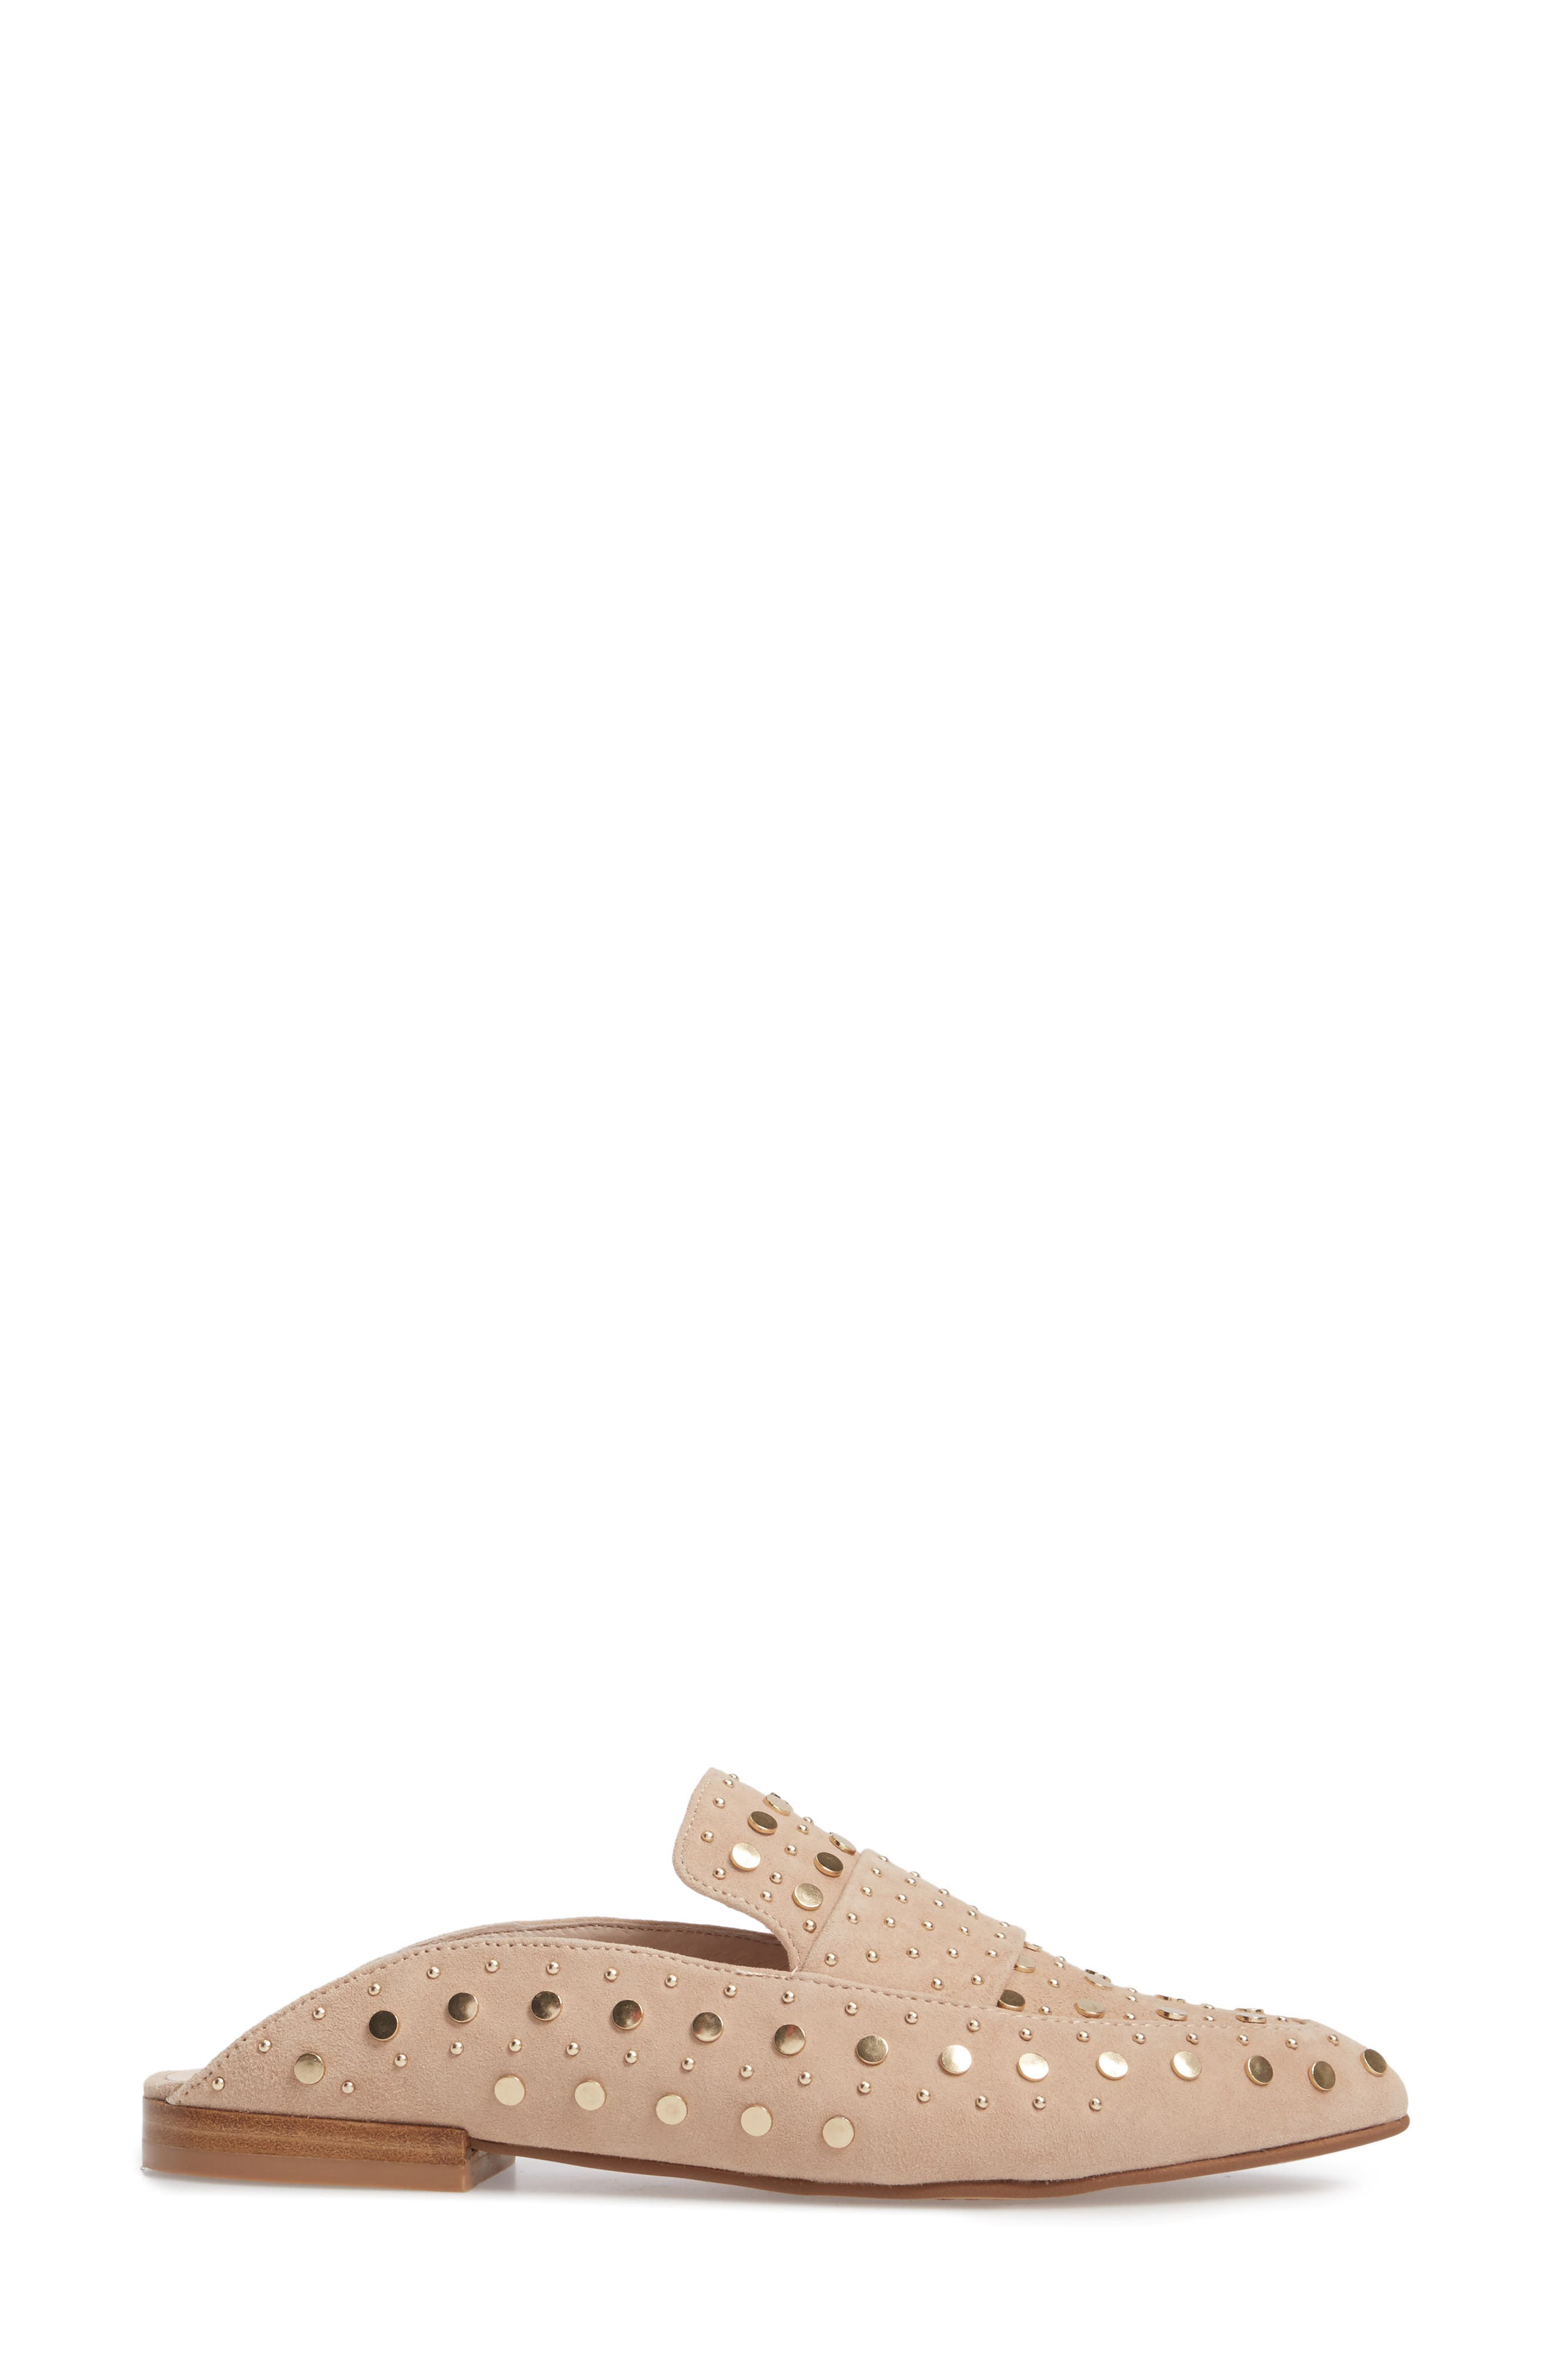 Alternate Image 3  - Kristin Cavallari Charlie Studded Loafer Mule (Women)